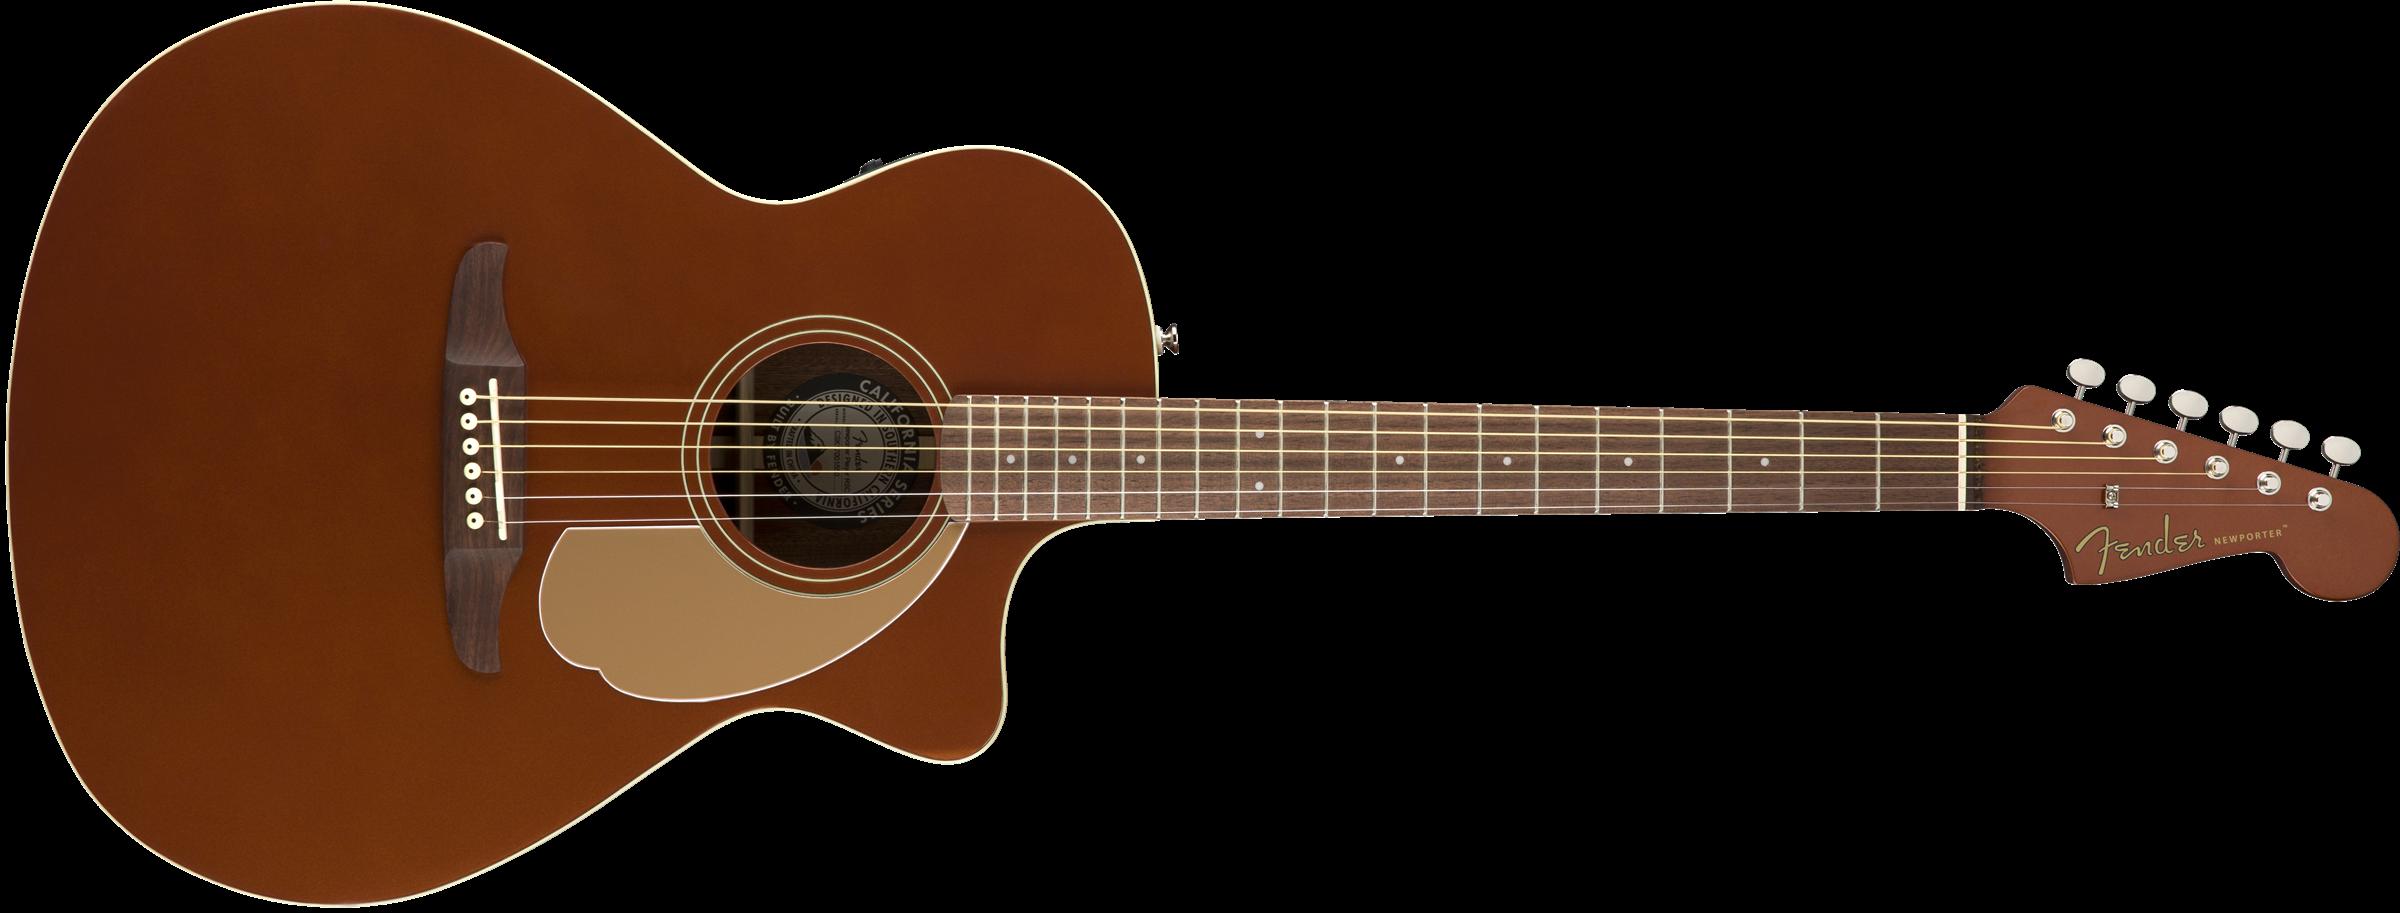 FENDER Newporter Player, Walnut Fingerboard, Rustic Copper